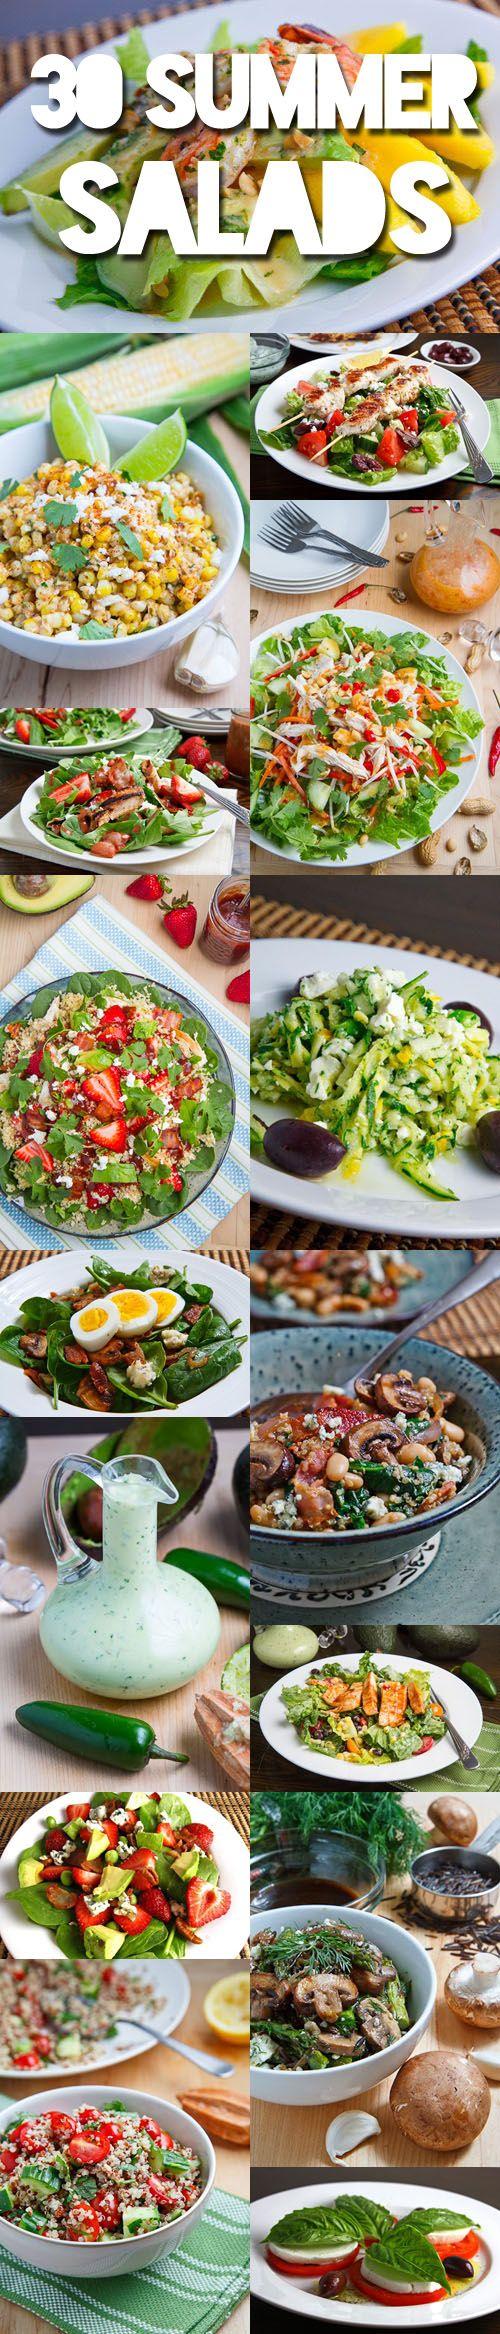 Delicious Summer Salads